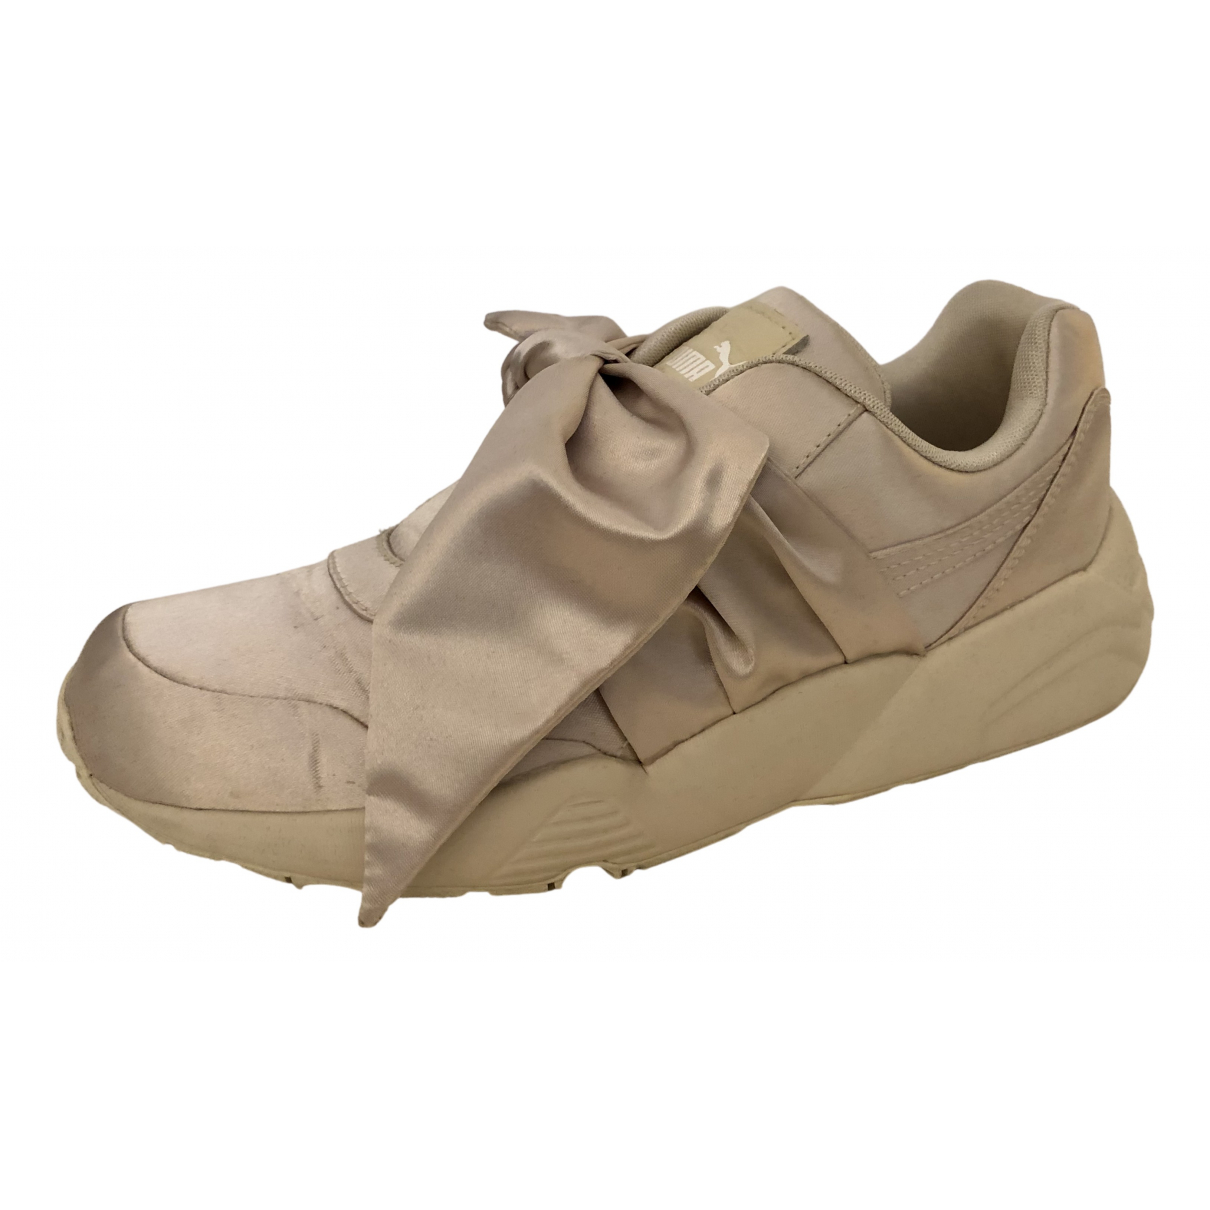 Fenty X Puma - Baskets   pour femme - beige